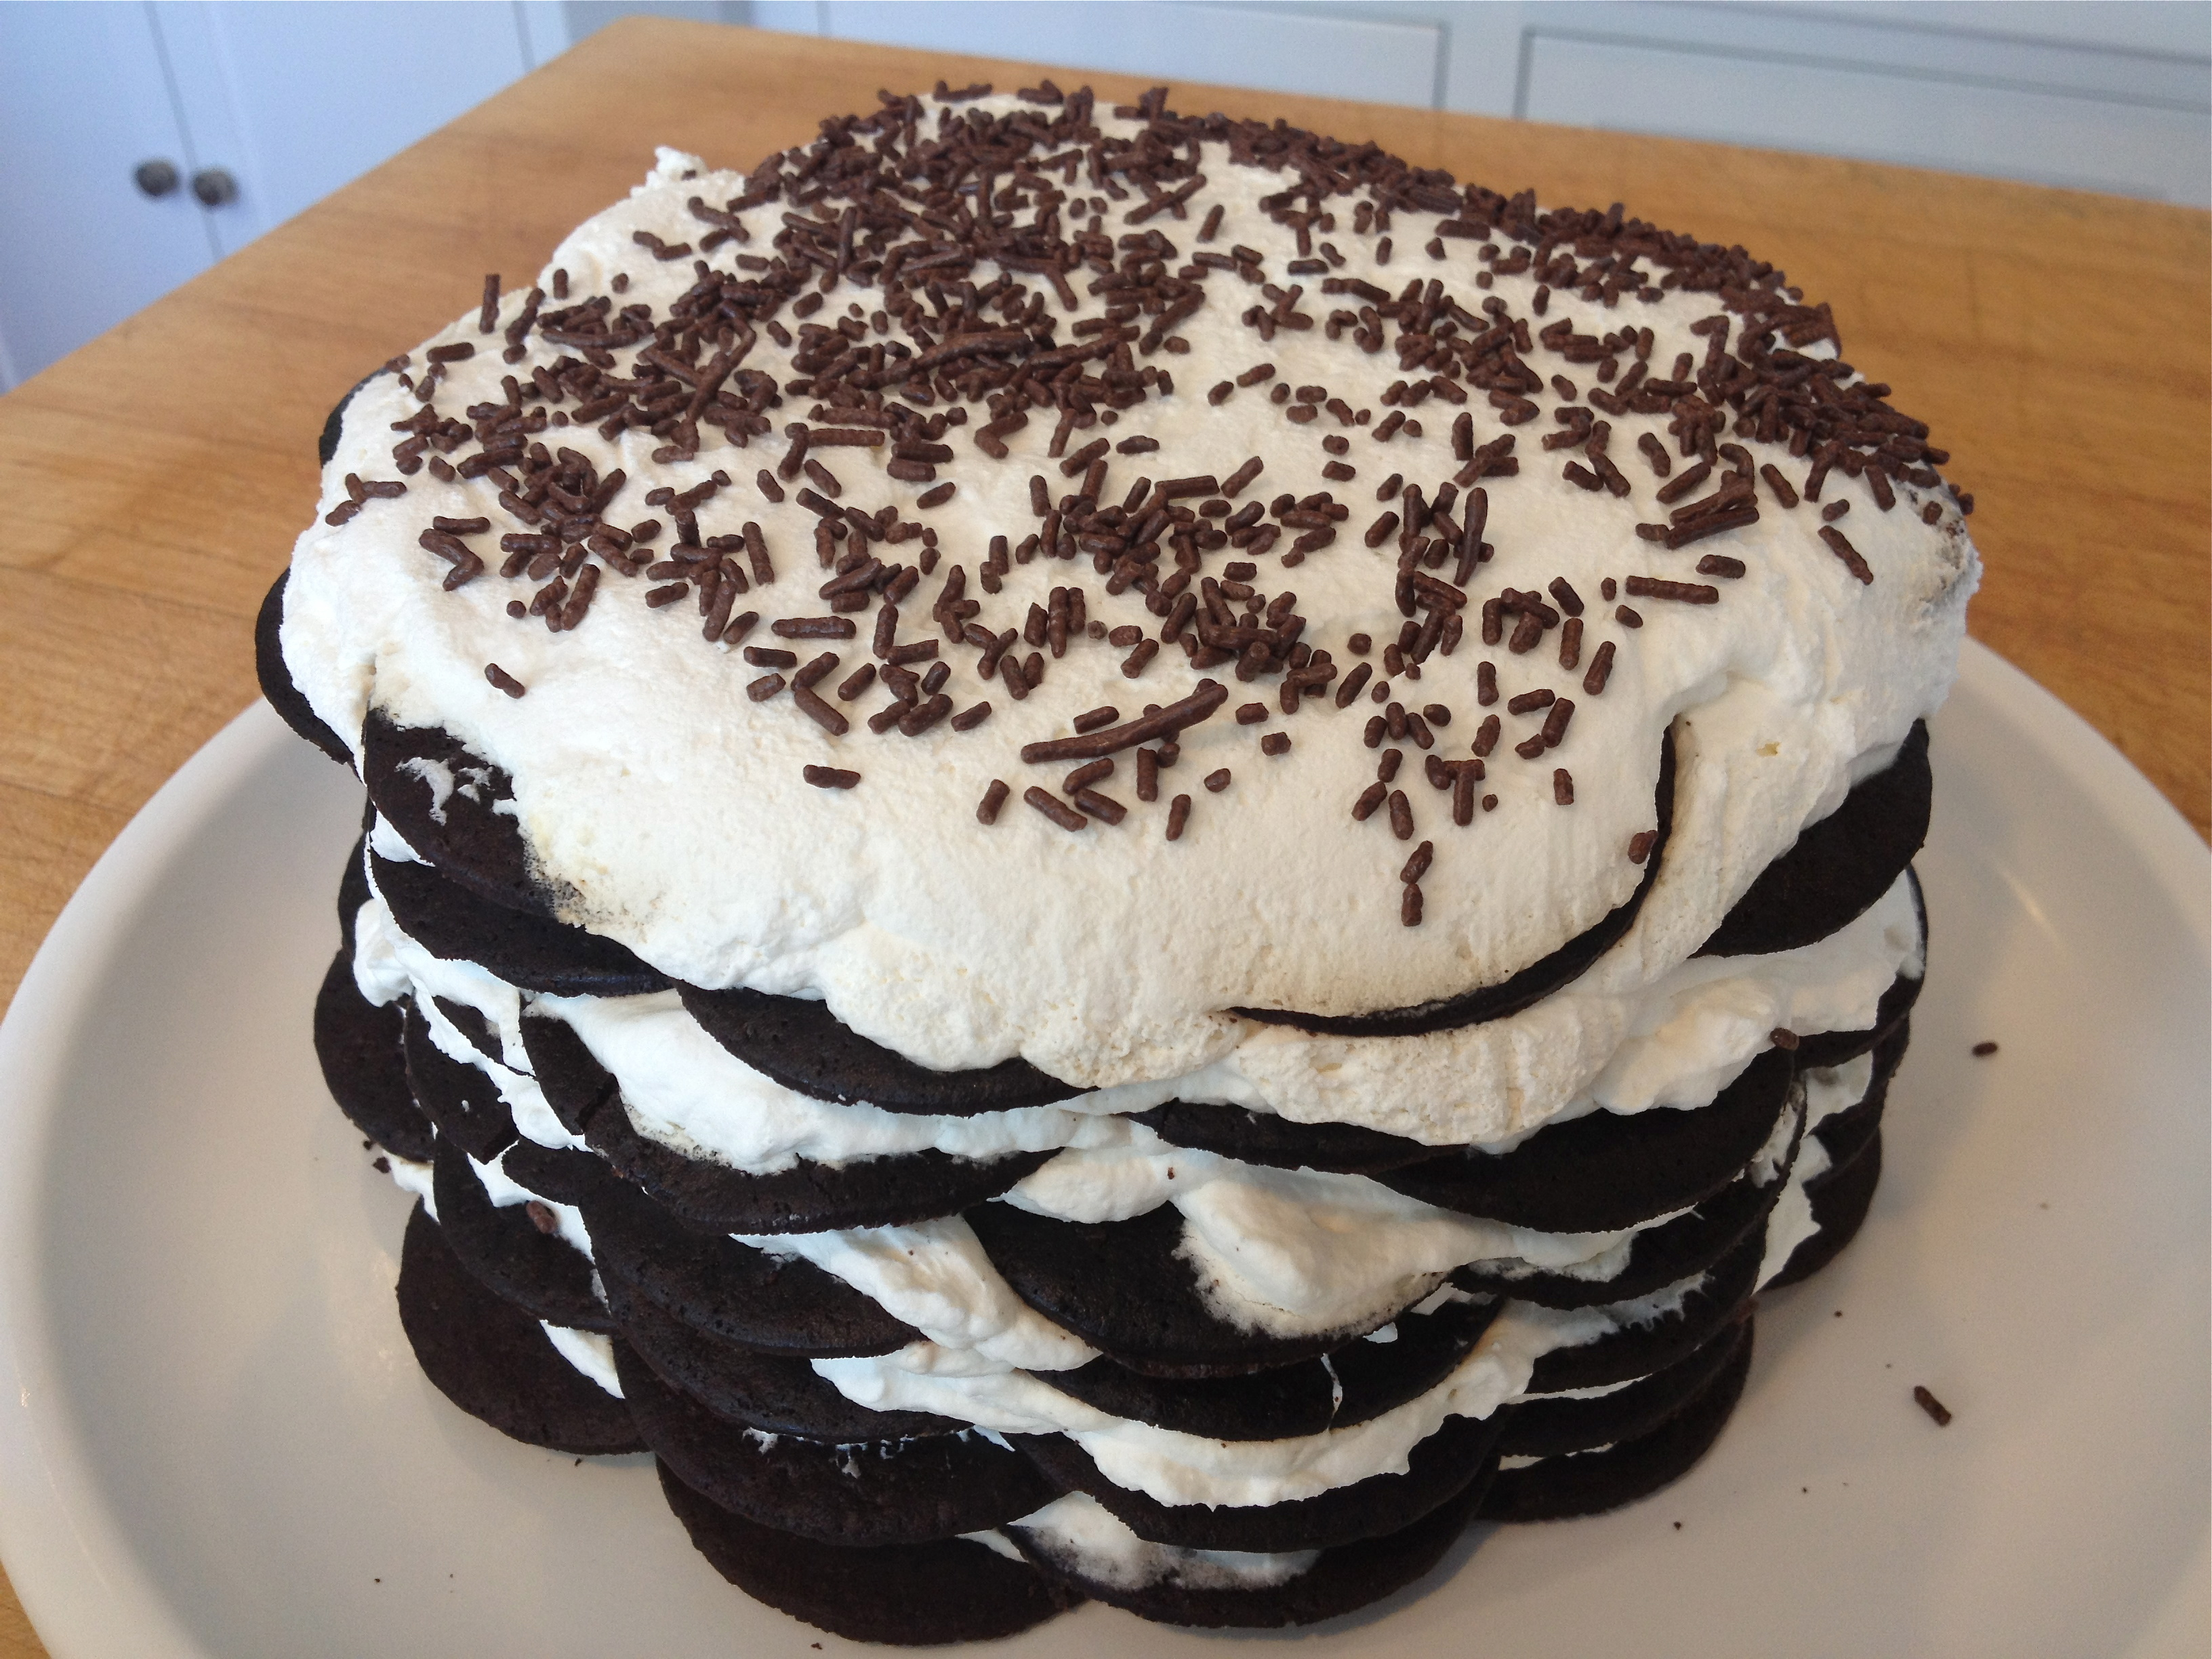 Pin Famous Wafer Chocolate Ice Cream Cake Cake on Pinterest